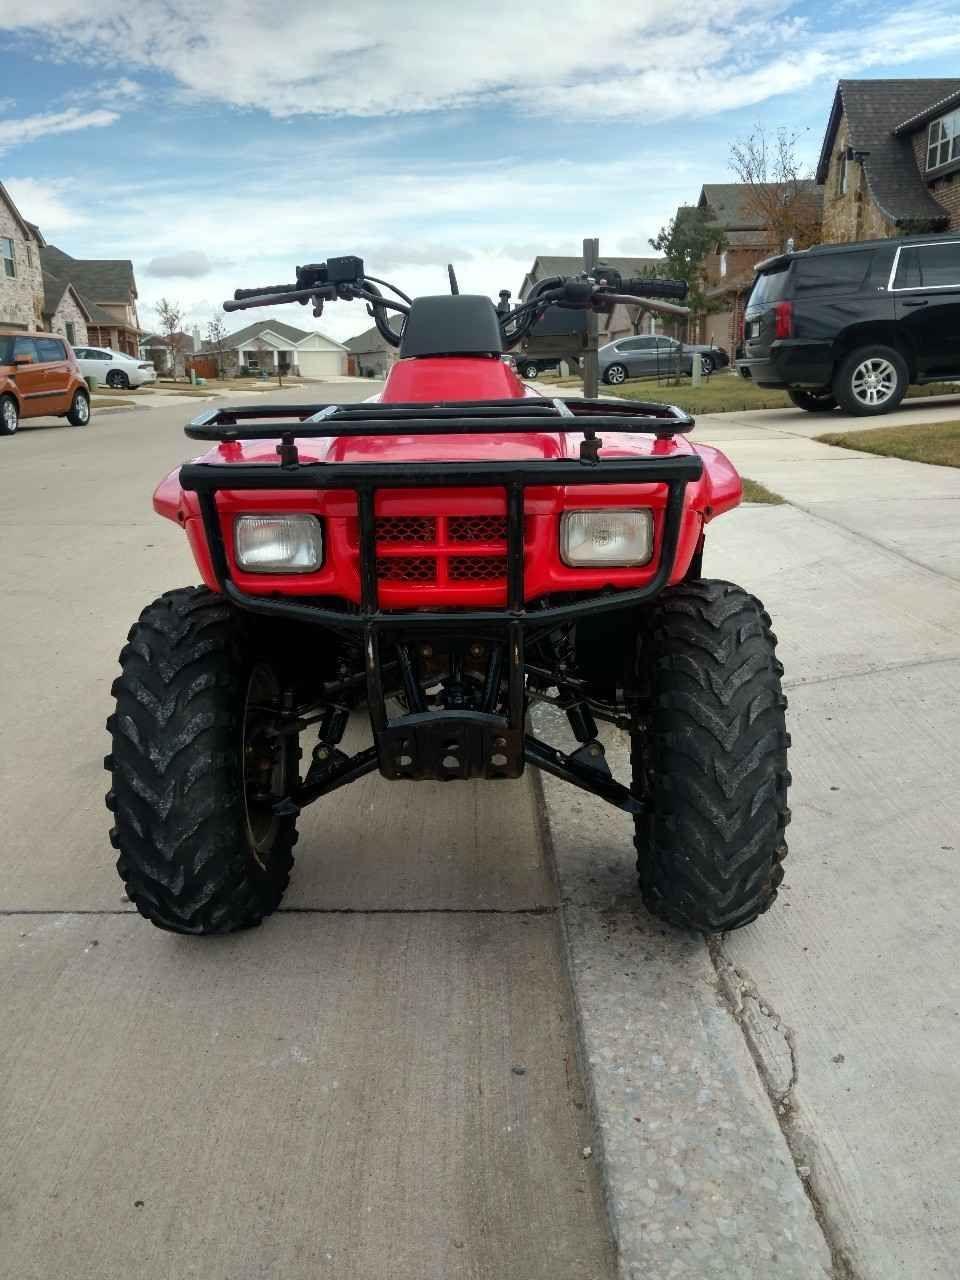 Used 2000 Honda FOURTRAX RECON 2X4 ATVs For Sale In Texas. 2000 Honda Recon  250